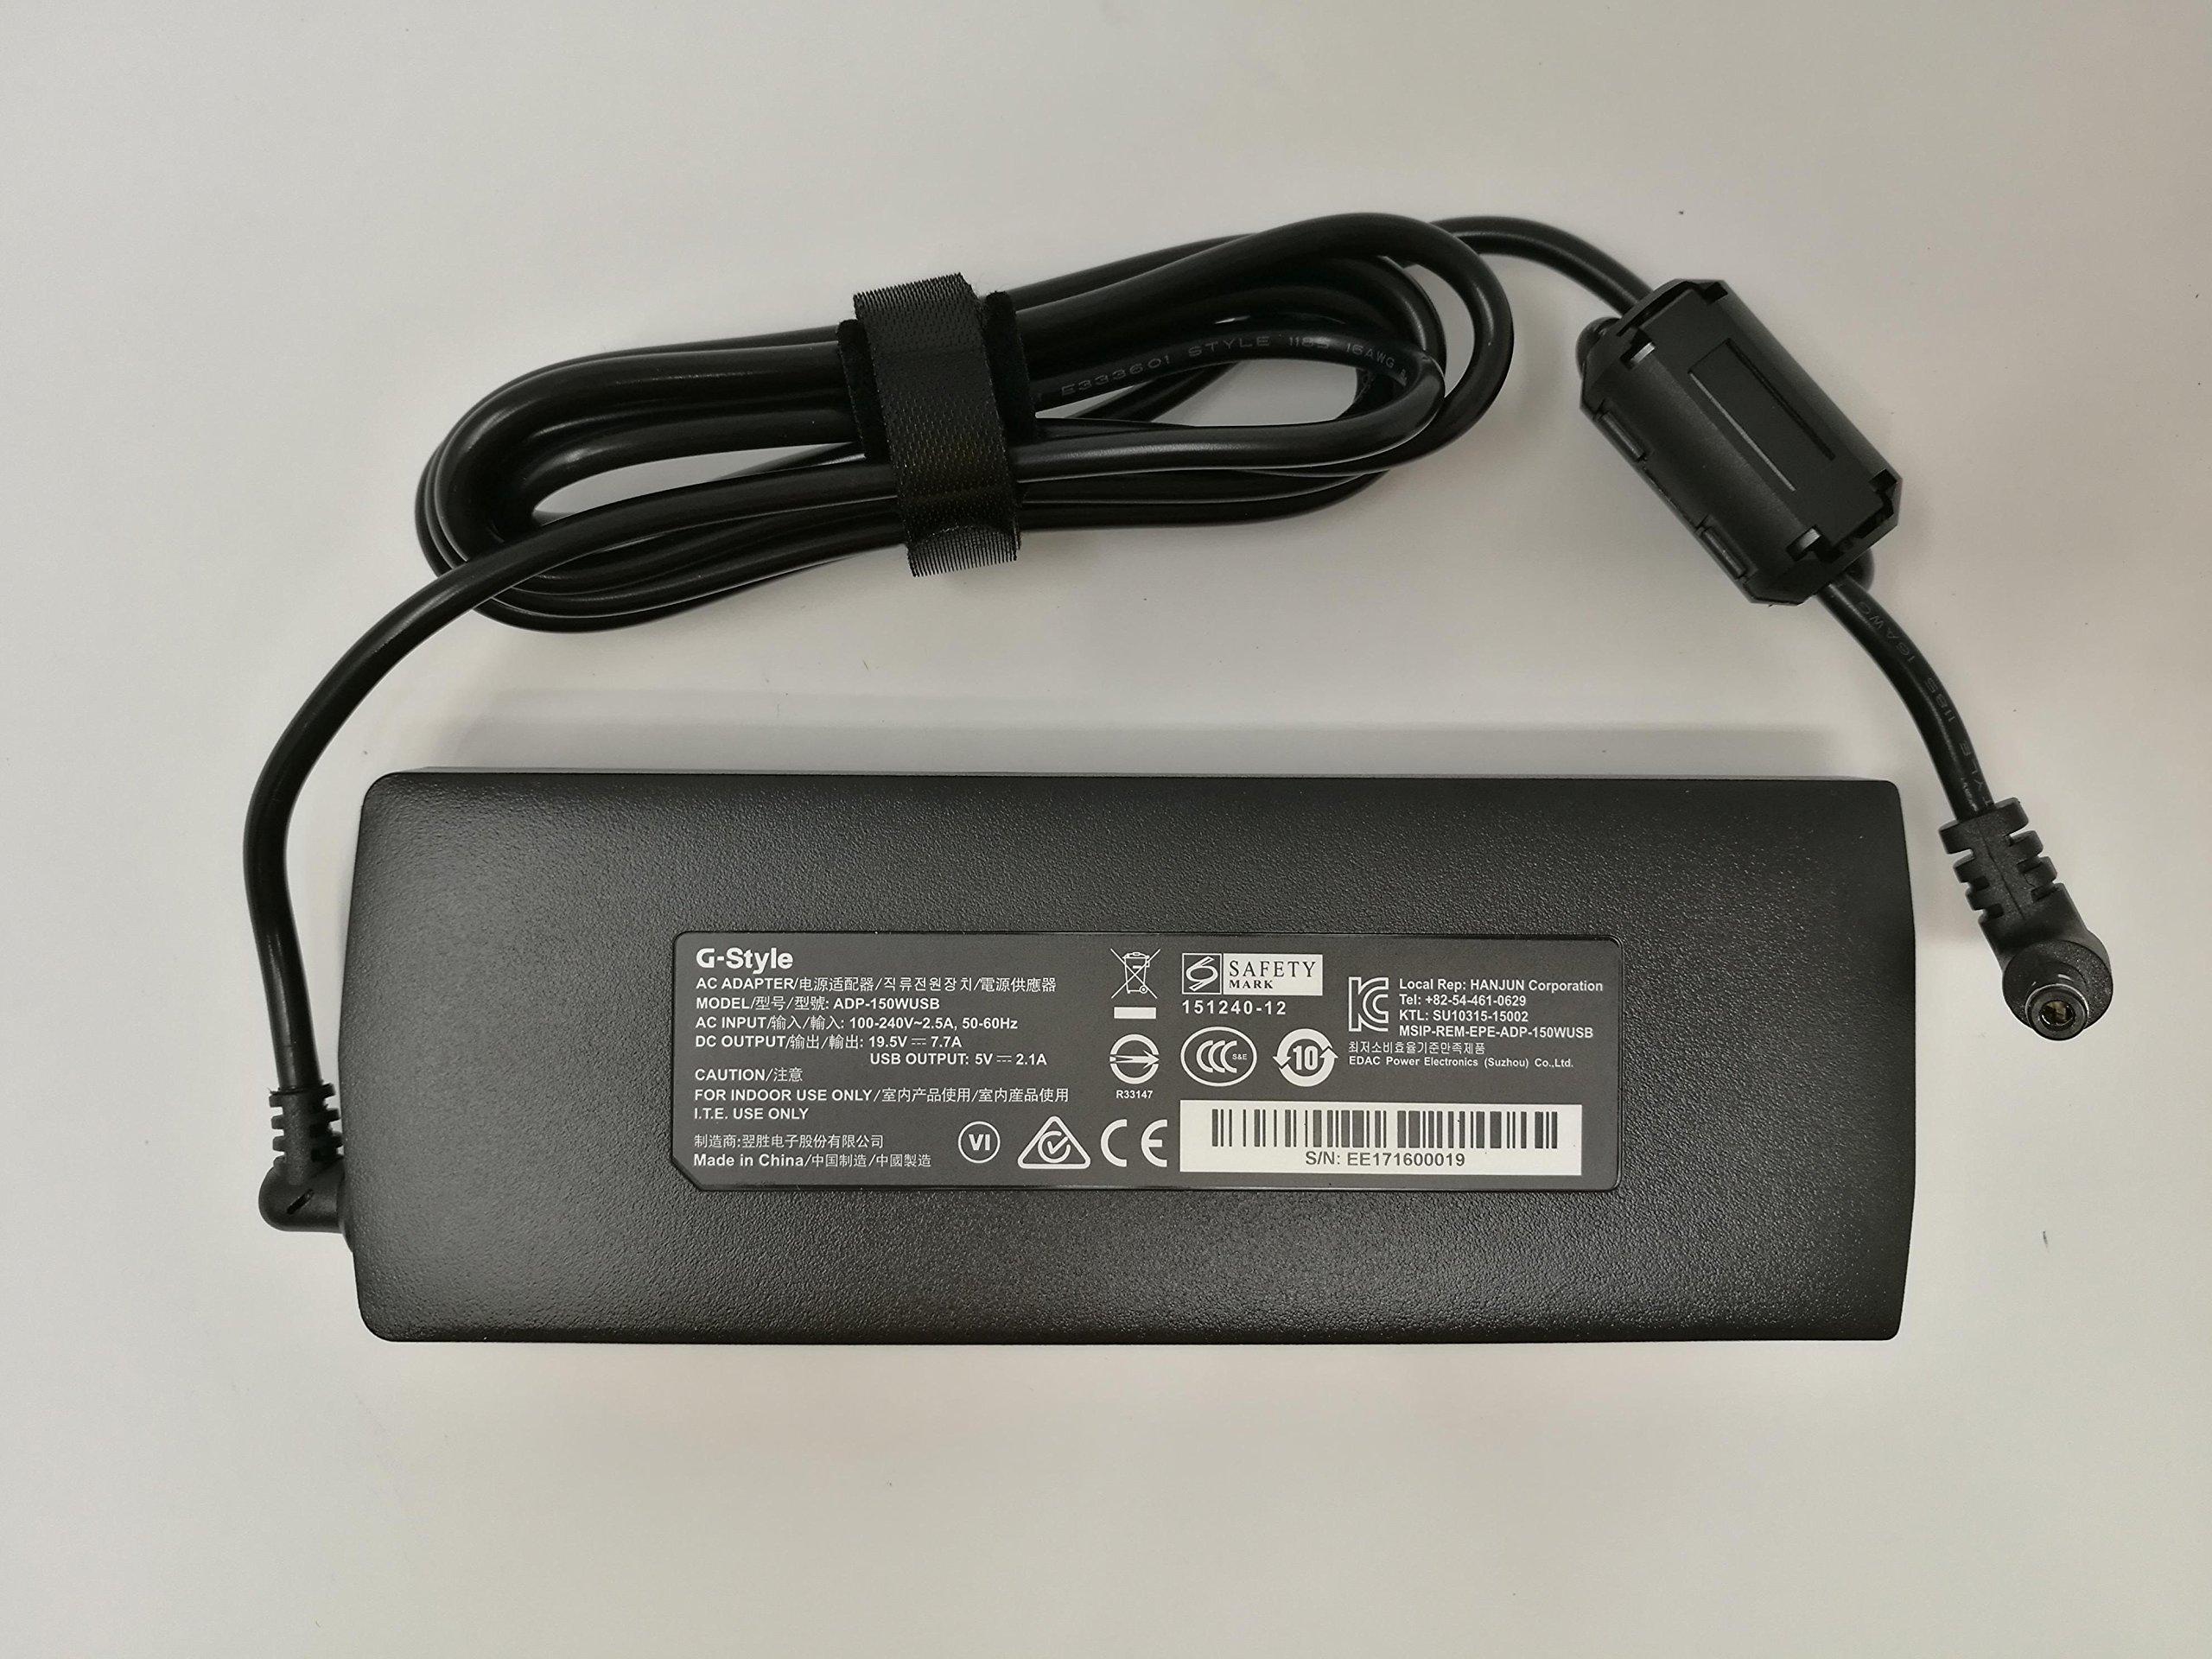 Genuine Authentic 150W AC Power Adapter Charger for GIGABYTE Gaming Laptop Aero 15w 14w 14k w/ GTX 1060, GTX 1050